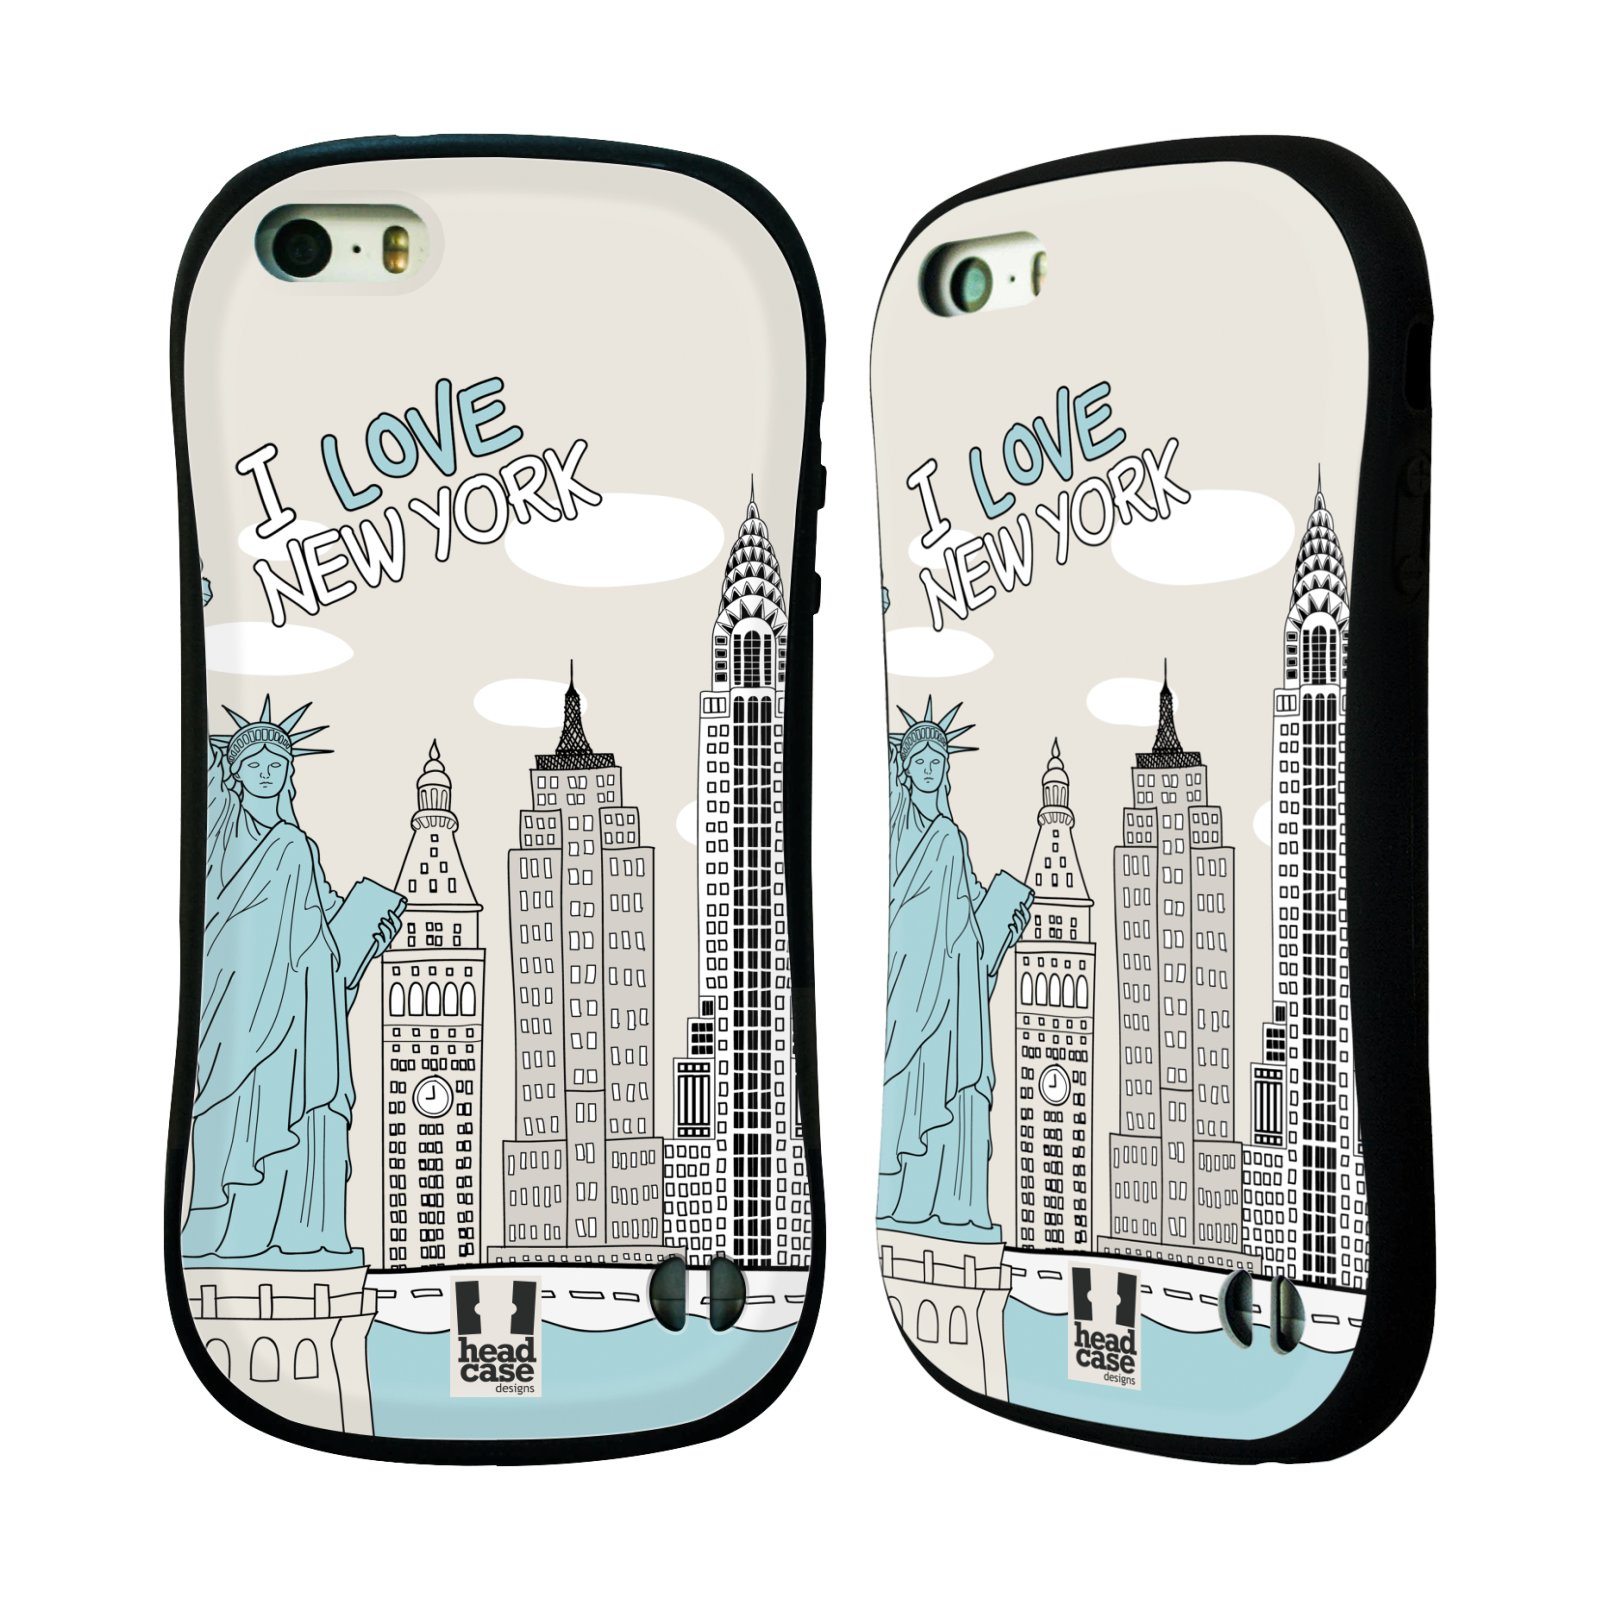 HEAD CASE silikon/plast odolný obal na mobil Apple Iphone 5/5S vzor Kreslená městečka MODRÁ, USA, New York, I LOVE NEW YORK